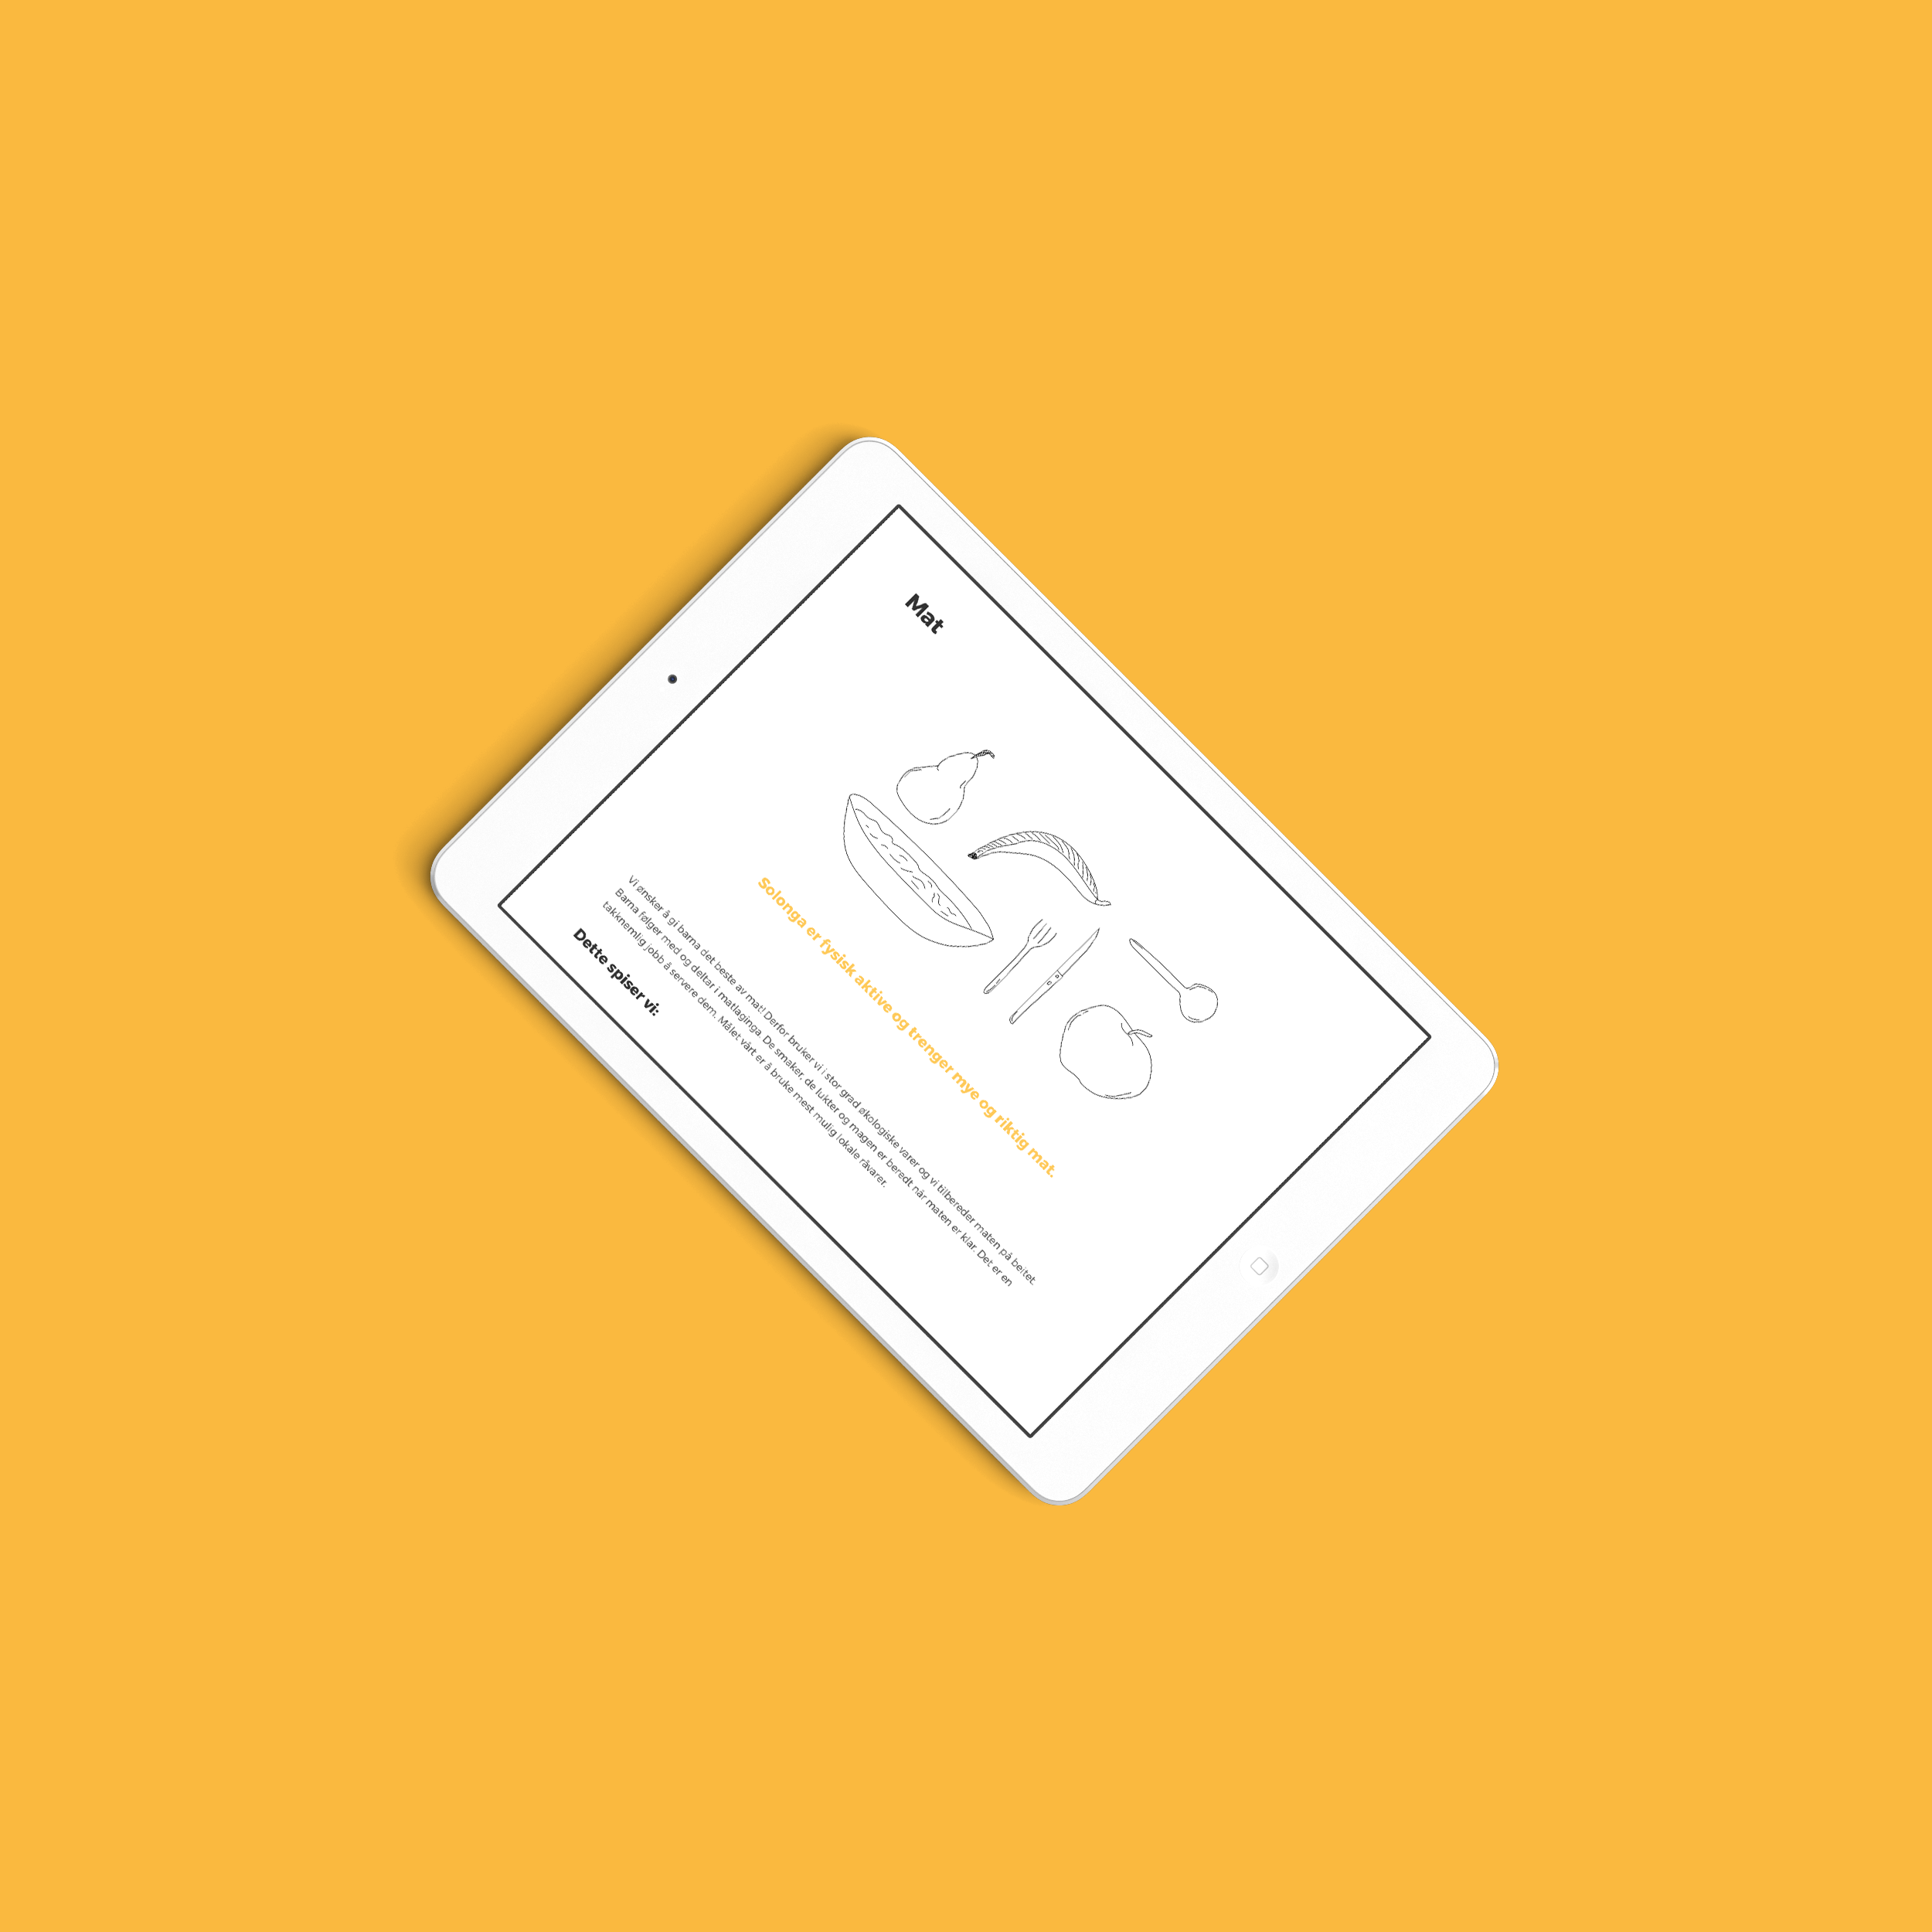 Solsida barnebeite web nettbrett/iPad